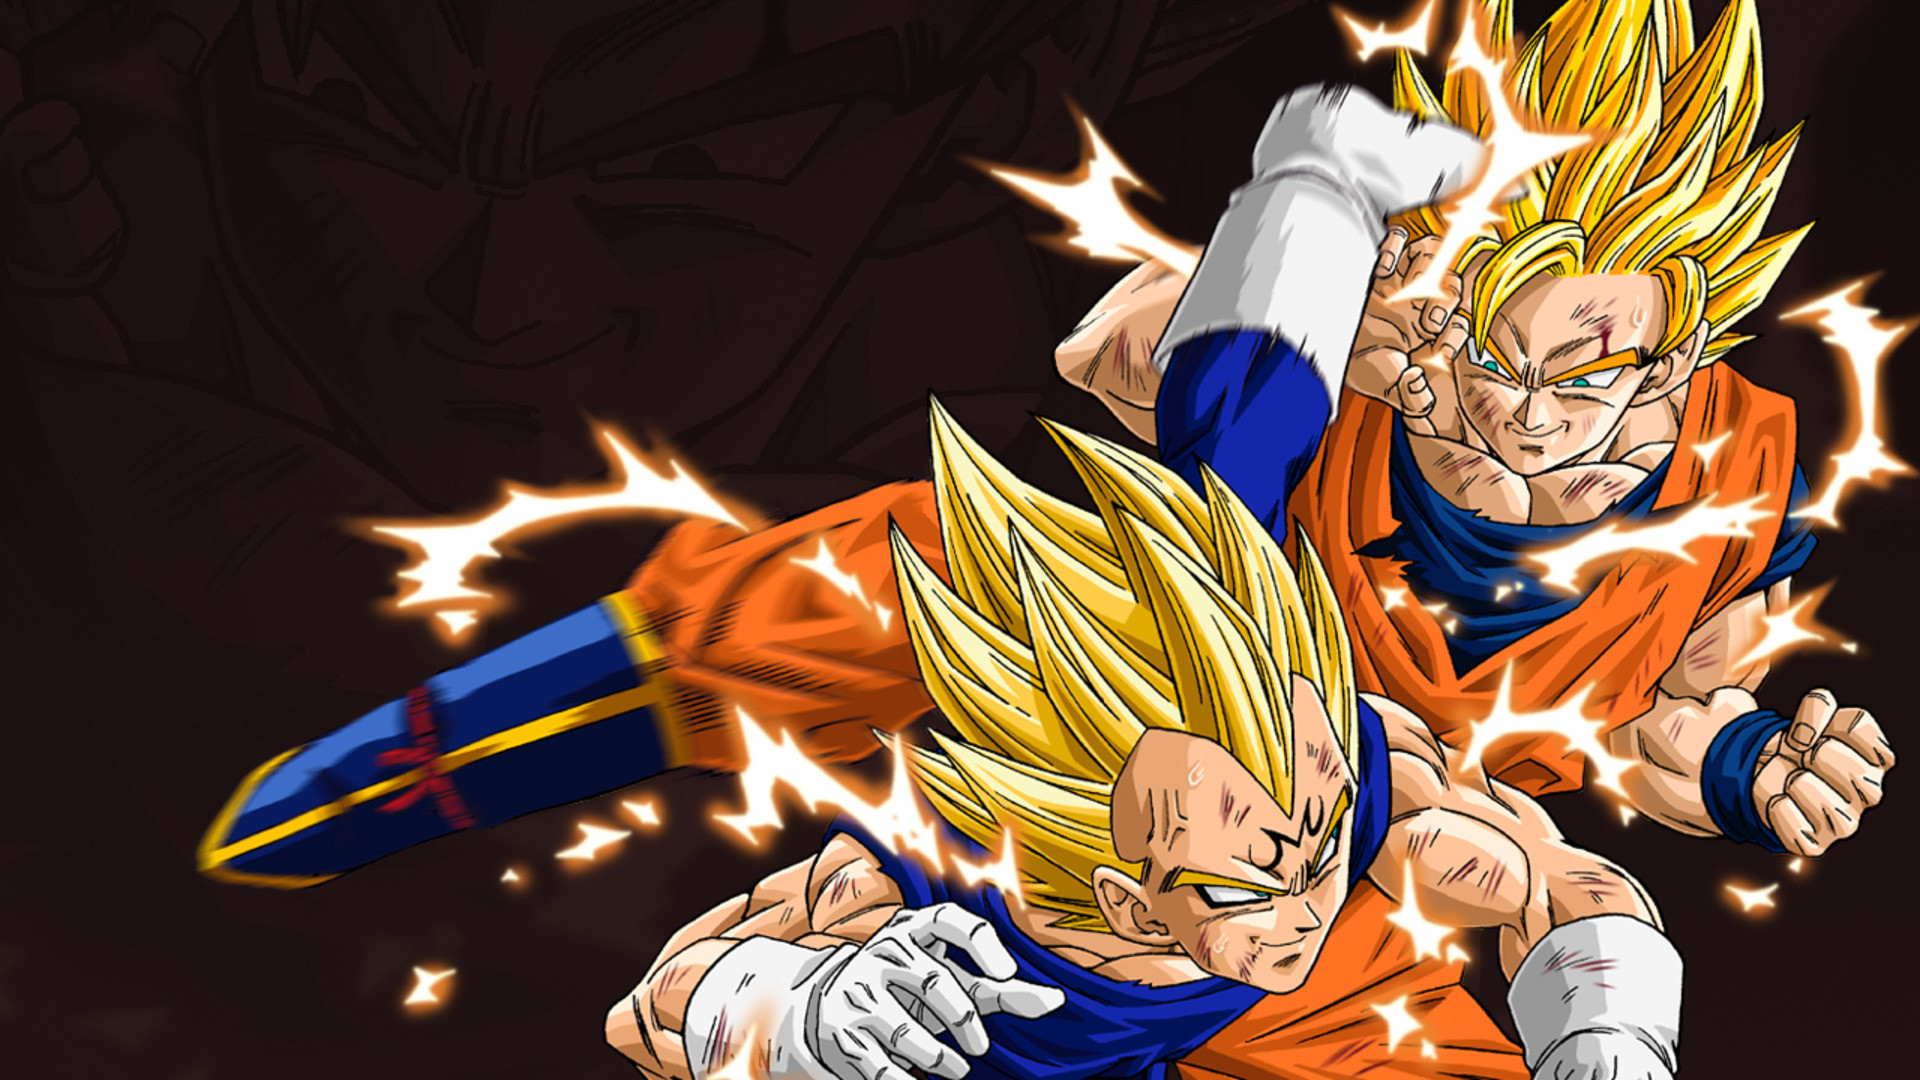 Goku & Vegeta Wallpaper – Dragon Ball Z Wallpaper (35713309) – Fanpop